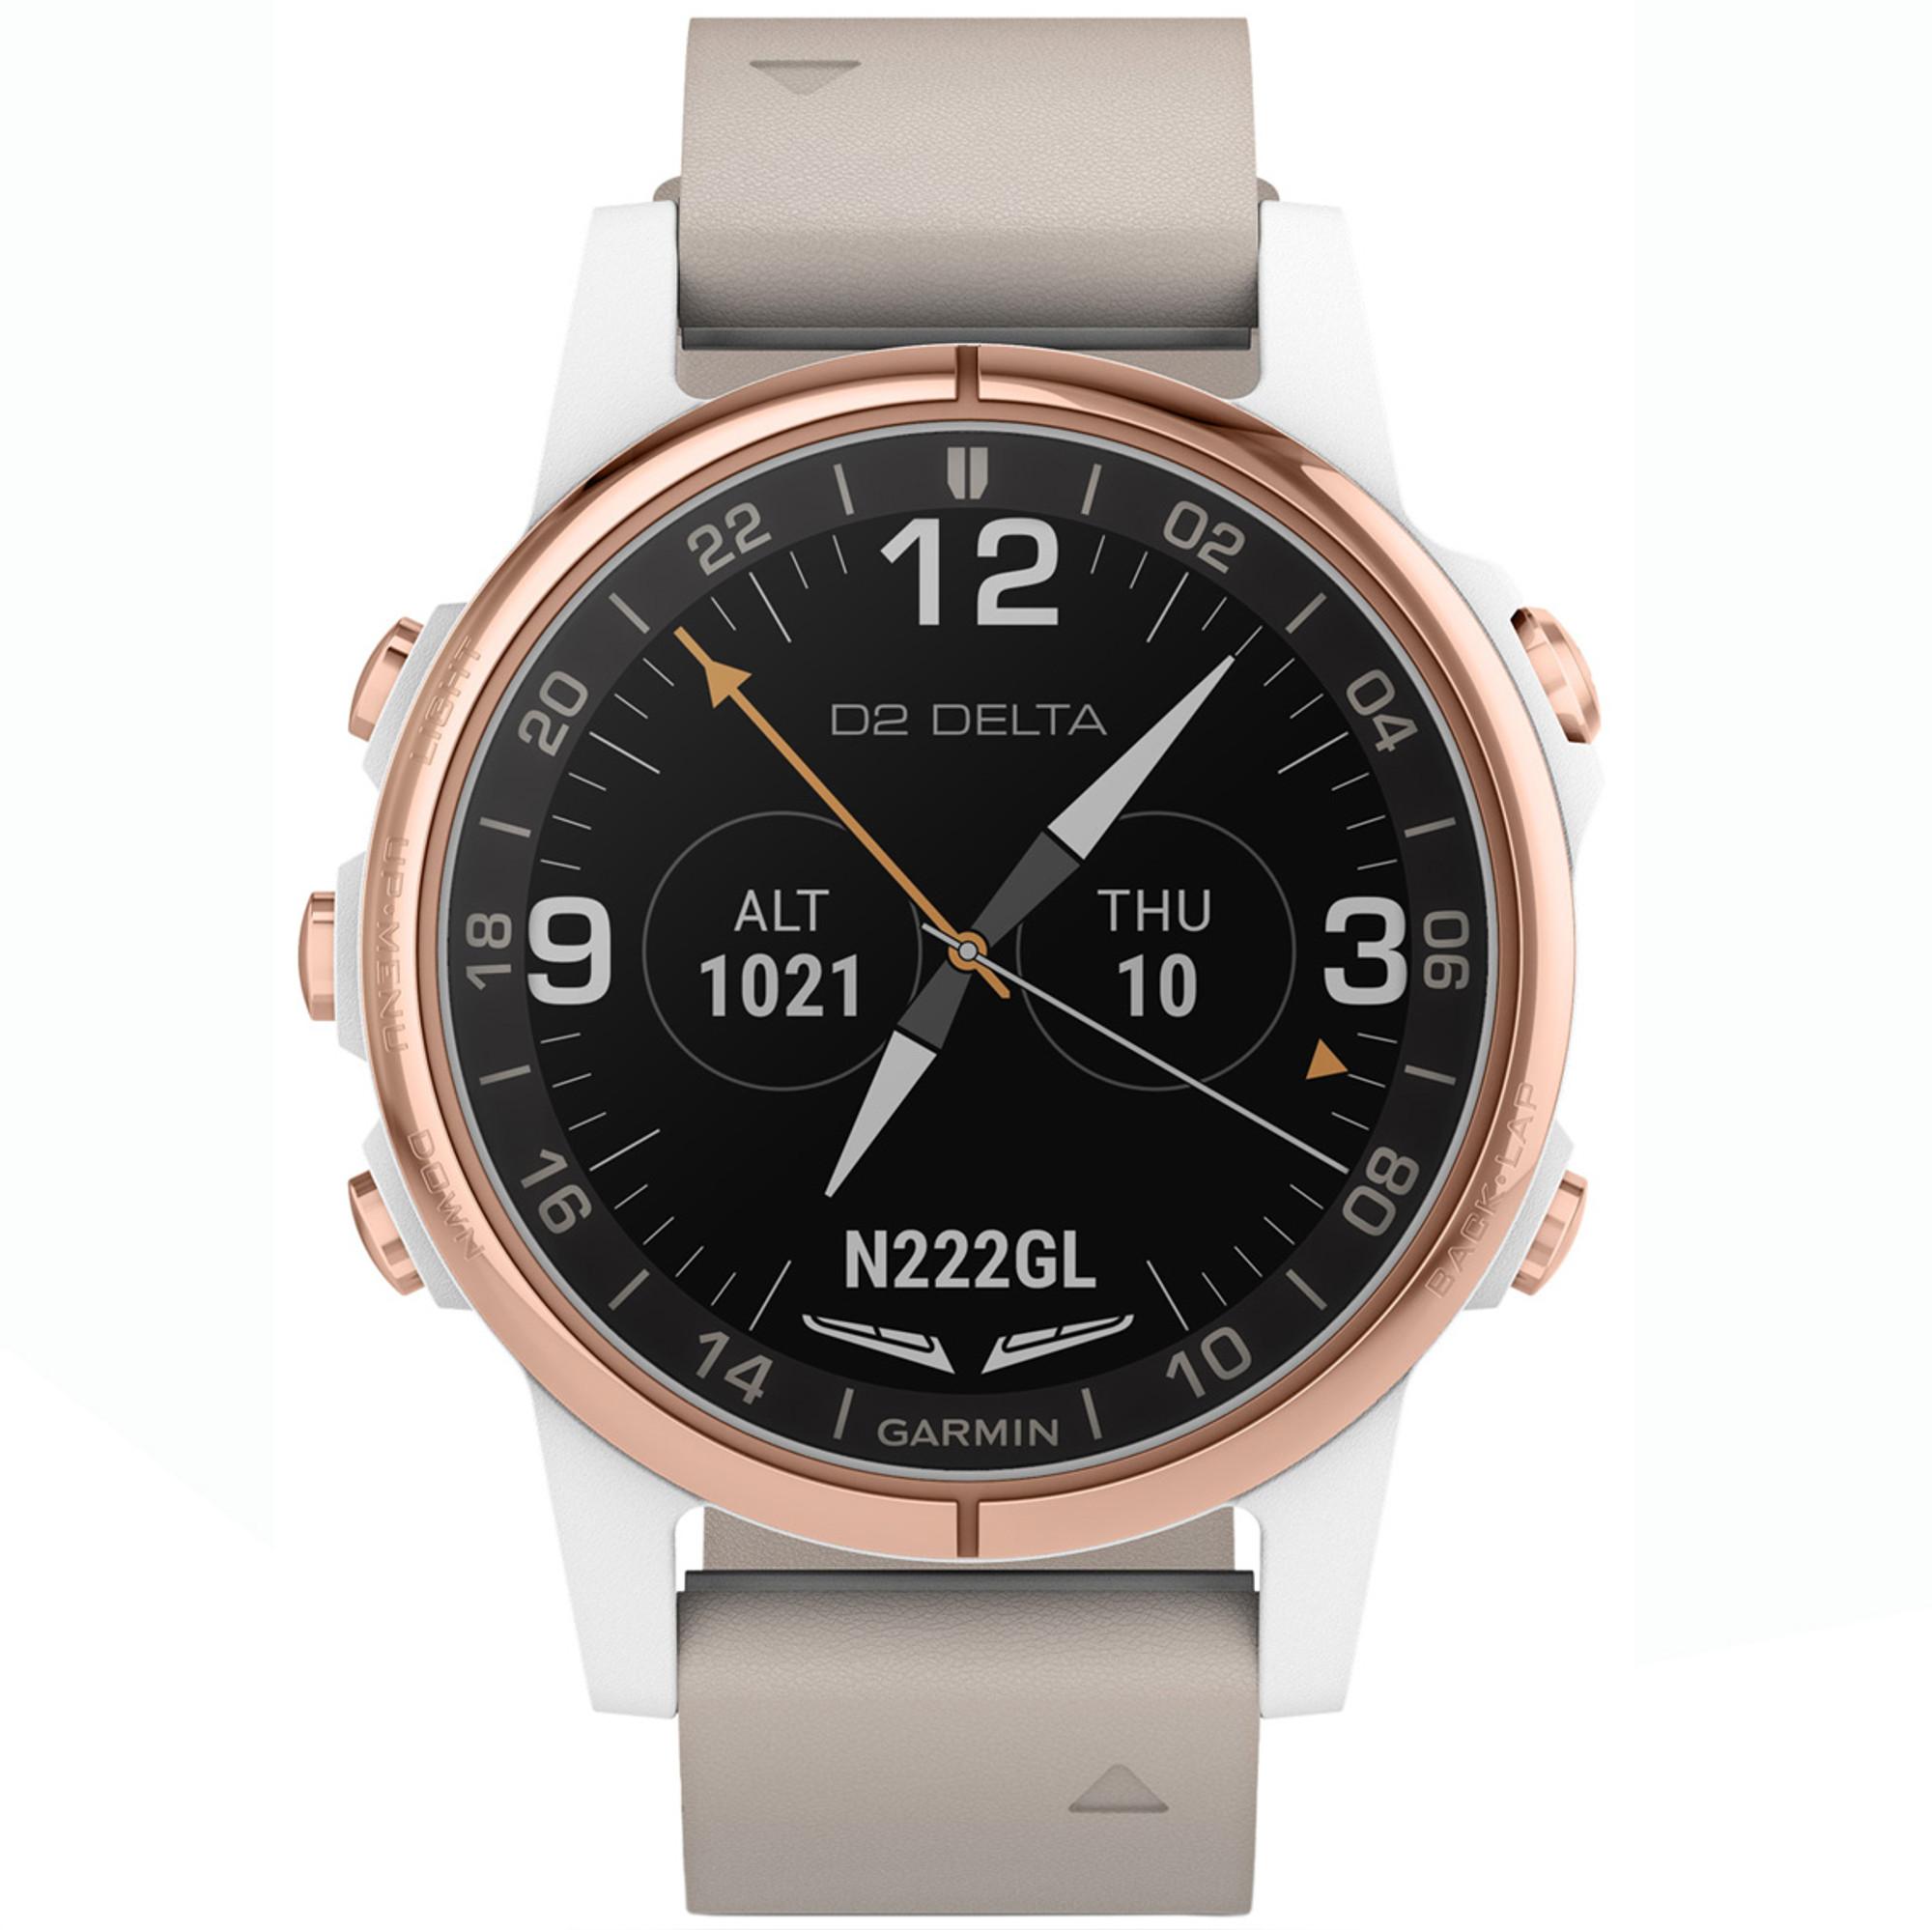 GARMIN D2 Delta S Aviator GPS Smartwatch 010-01987-31